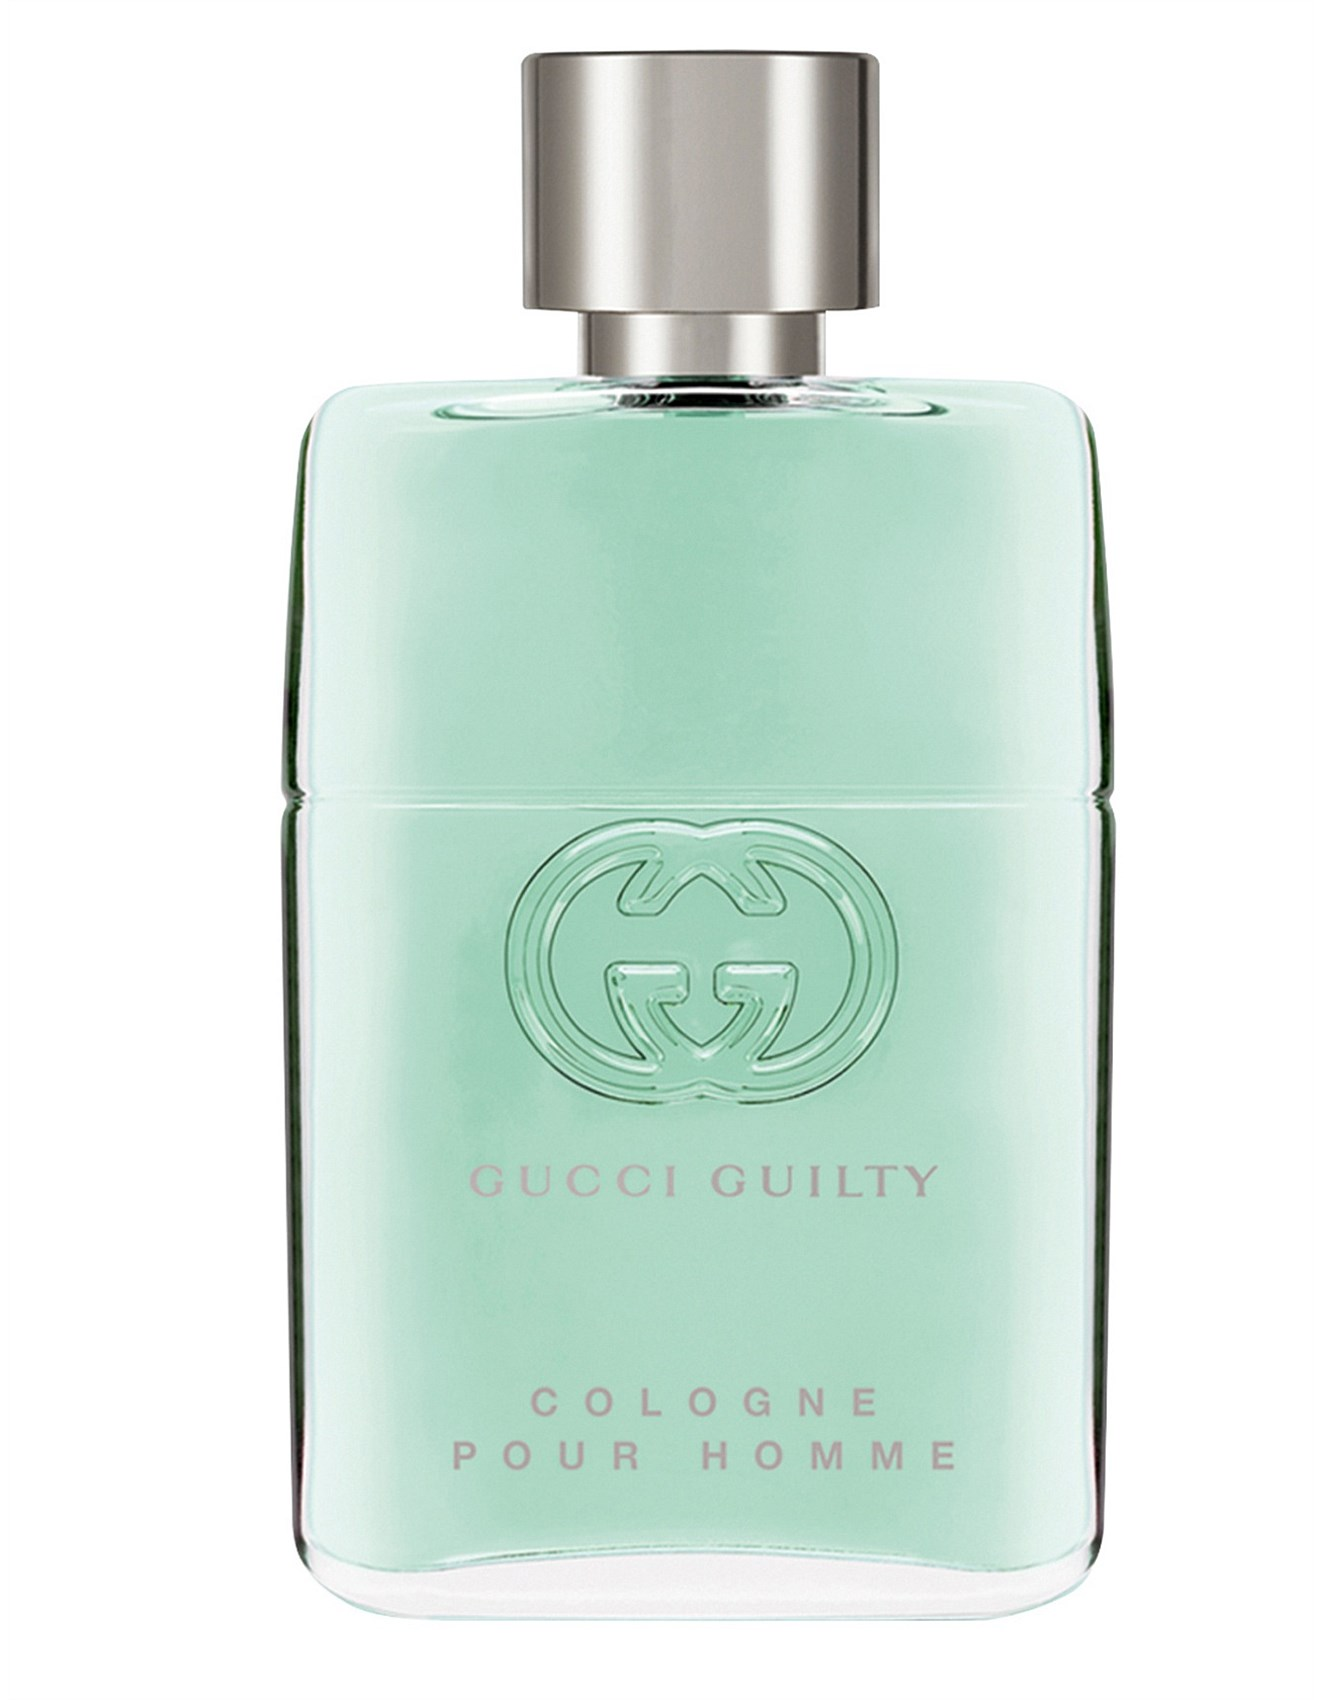 a97f52656 Perfume | Buy Fragrances & Perfume Online | David Jones - Gucci ...